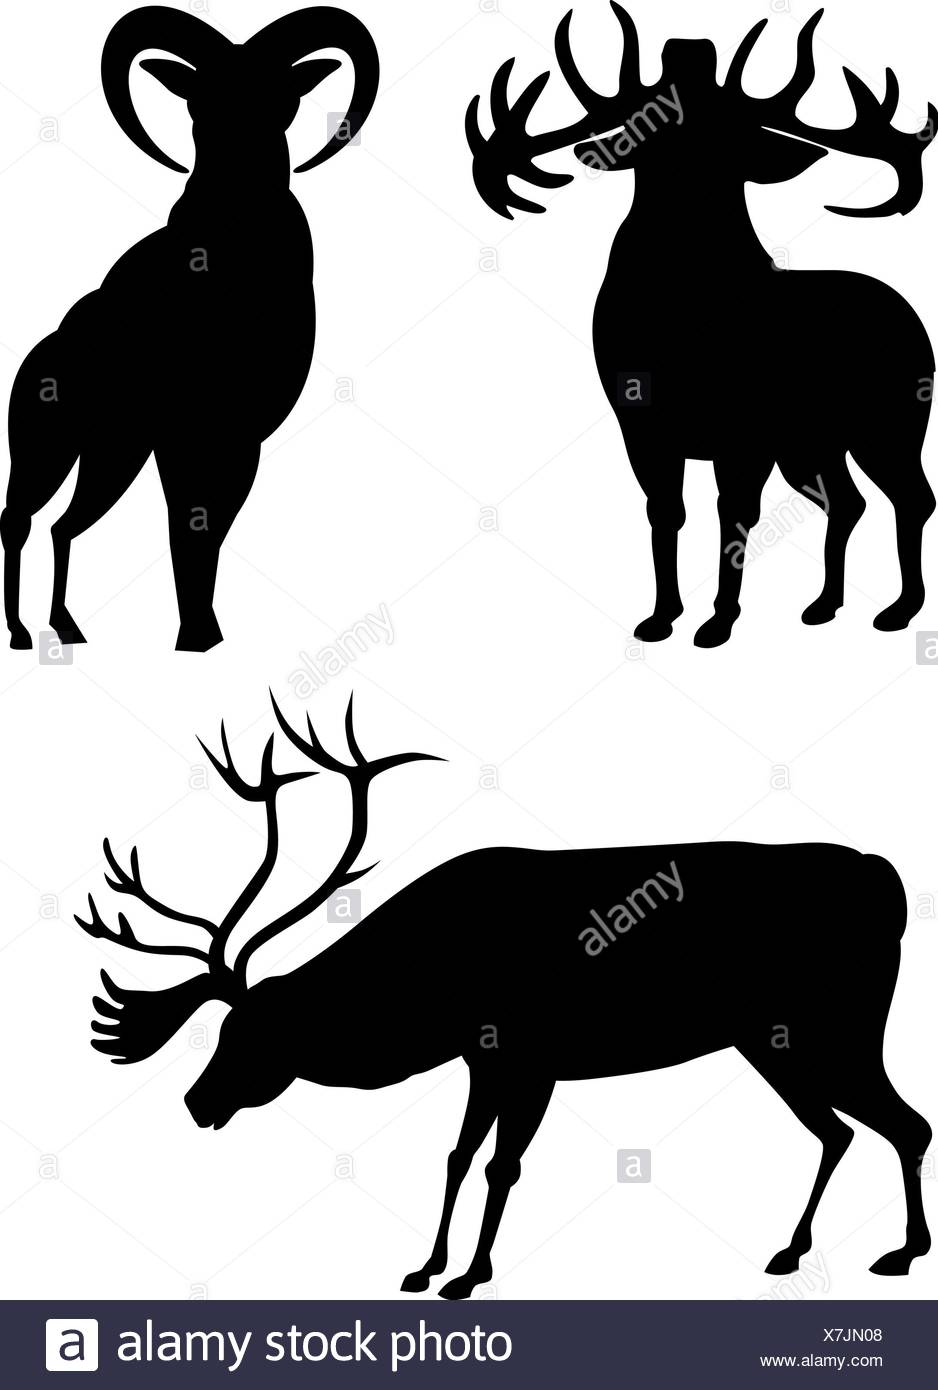 938x1390 Elk Silhouette Stock Photos amp Elk Silhouette Stock Images